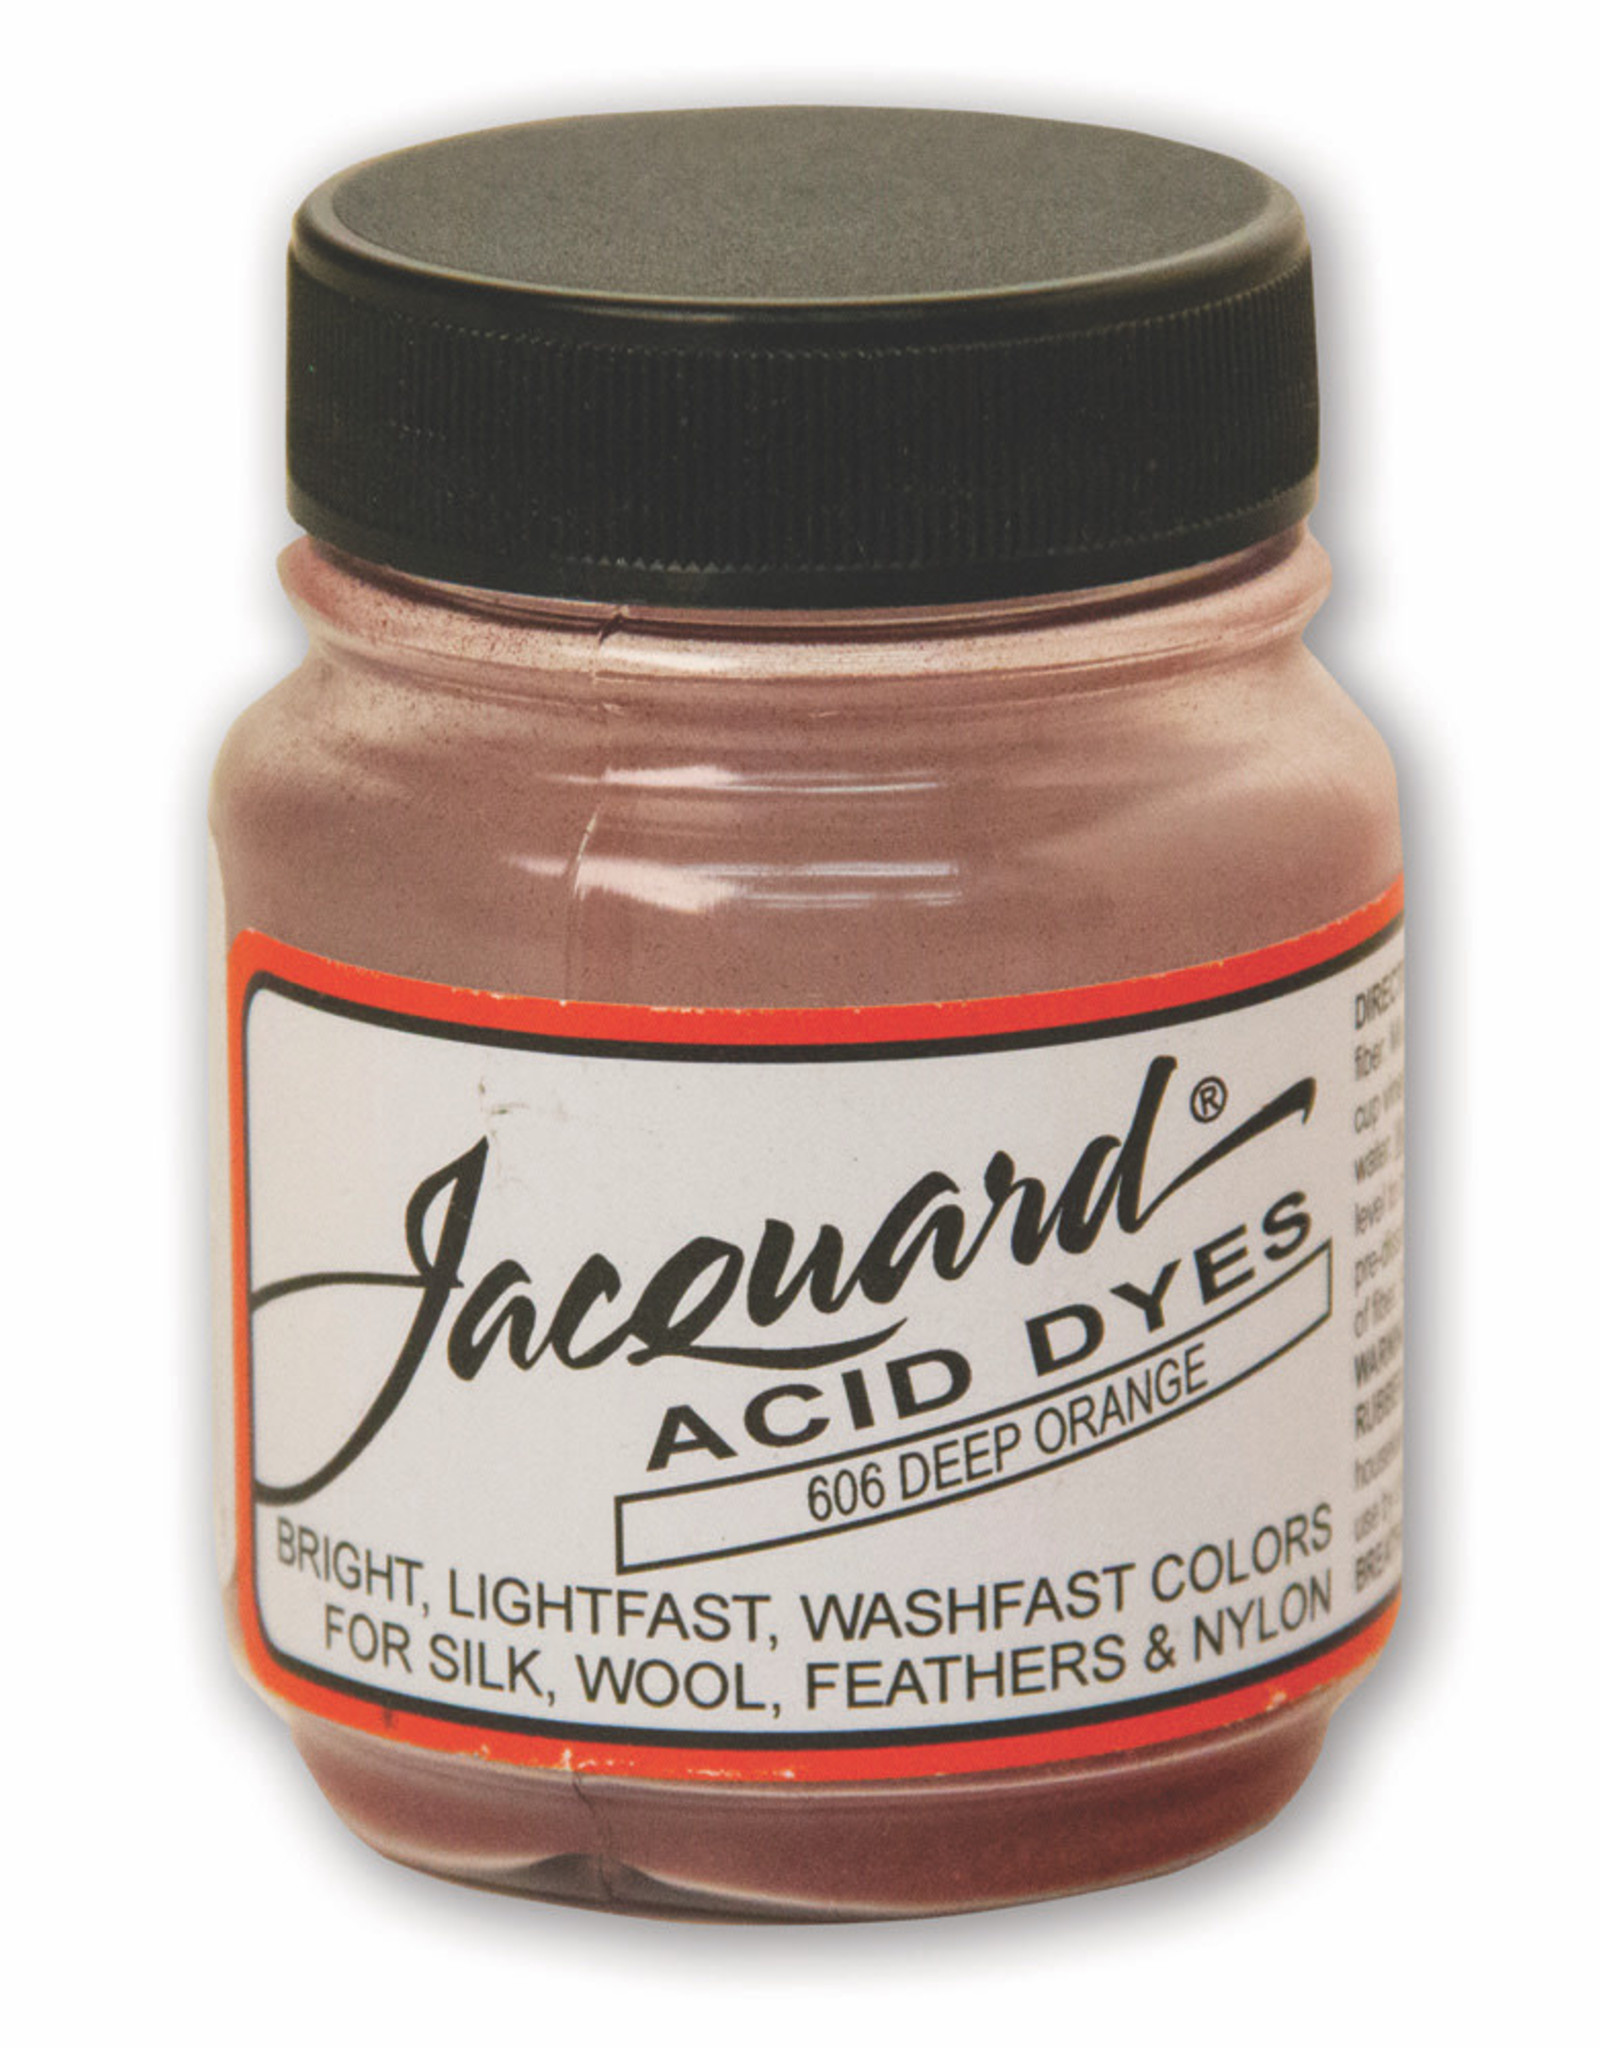 Jacquard Jacquard Acid Dye #606 Deep Orange 1/2oz